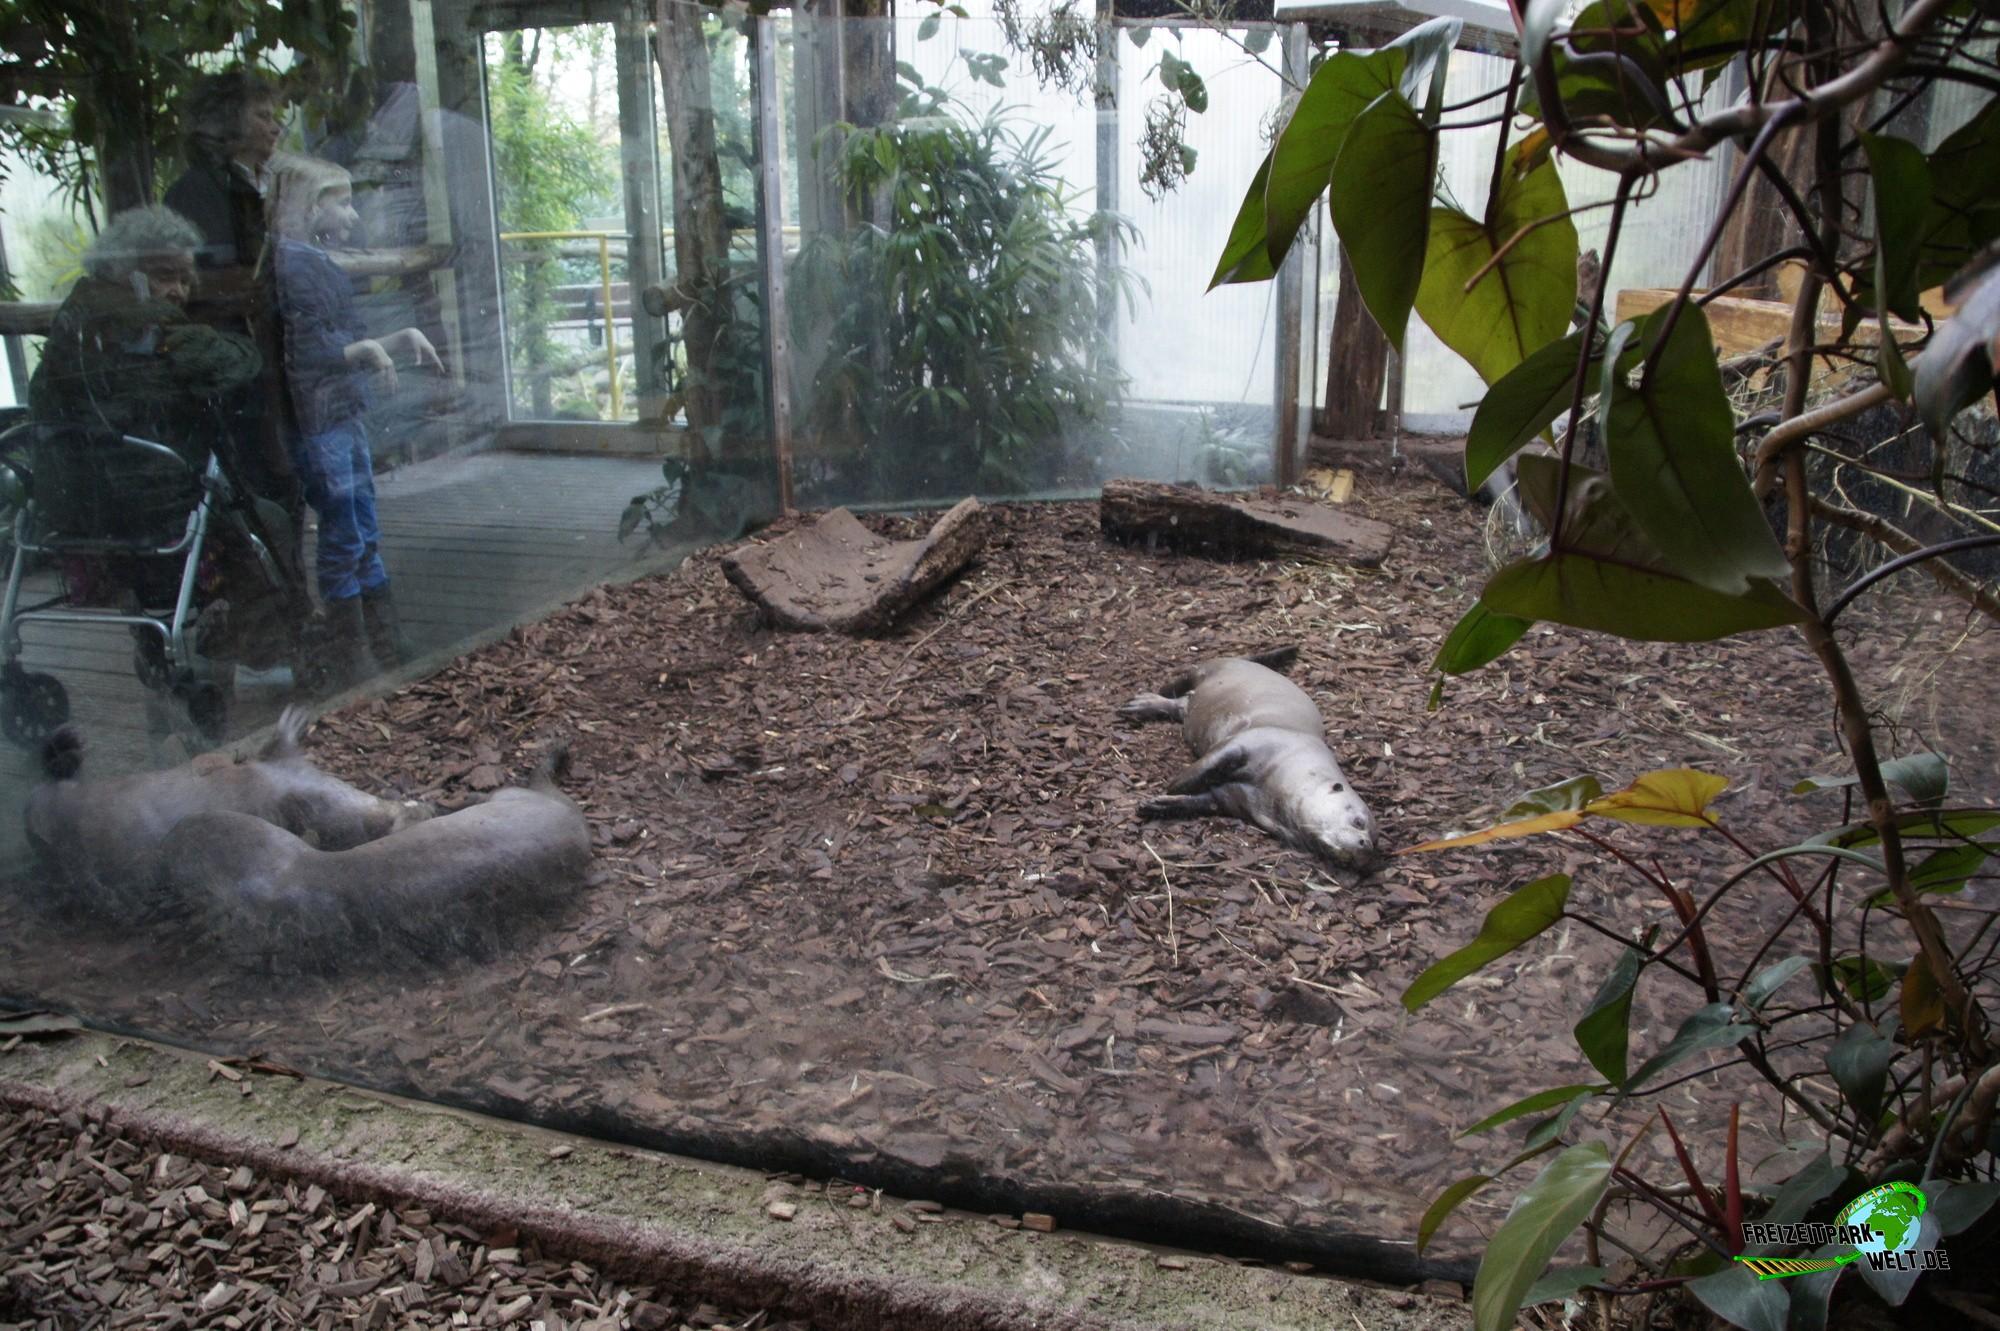 riesenotter zoo dortmund freizeitpark. Black Bedroom Furniture Sets. Home Design Ideas